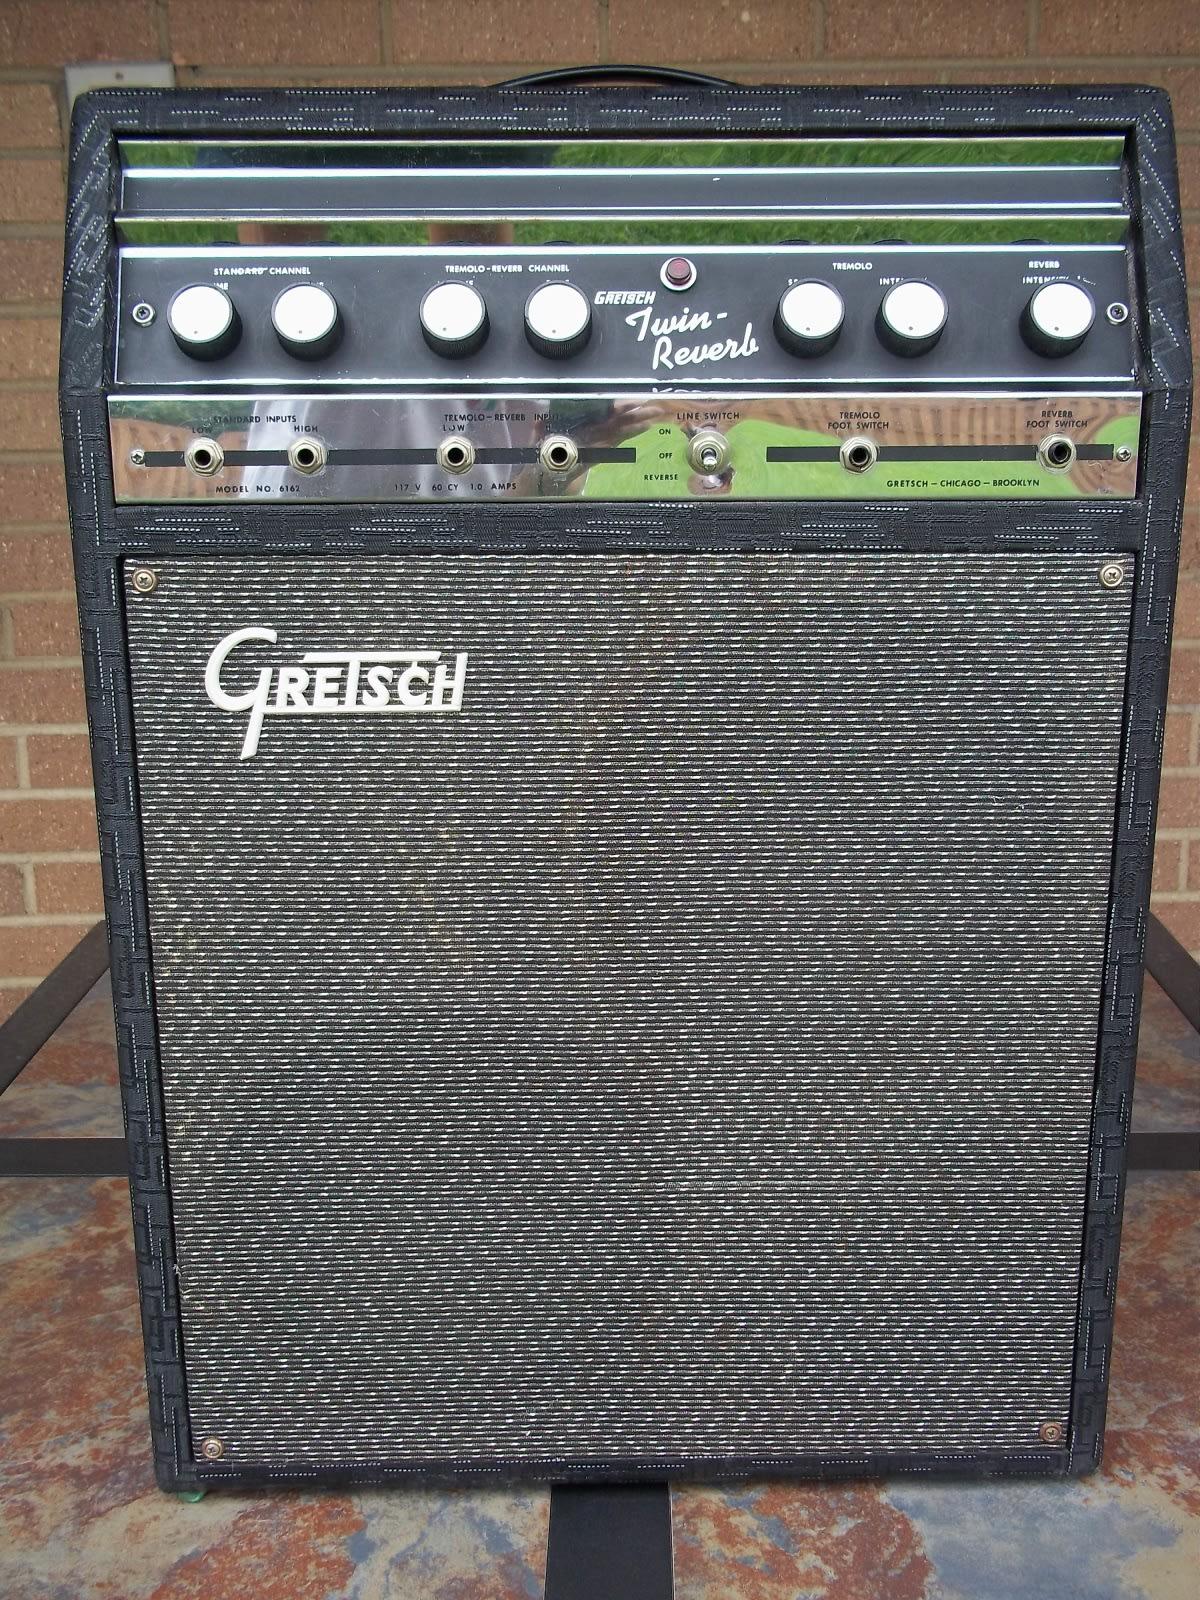 Gretsch Twin Reverb - Model 6162 Black Tolex - 1968 Valco